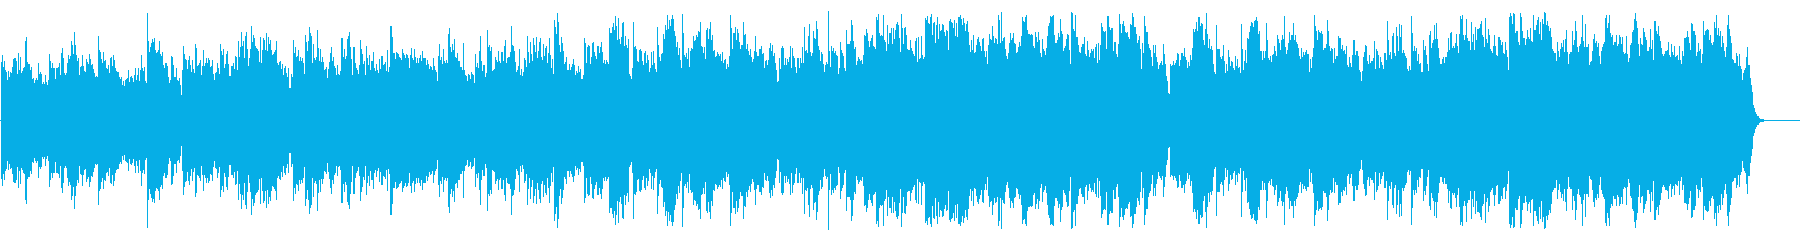 「G線上のアリア」をヒーリングアレンジでの再生済みの波形